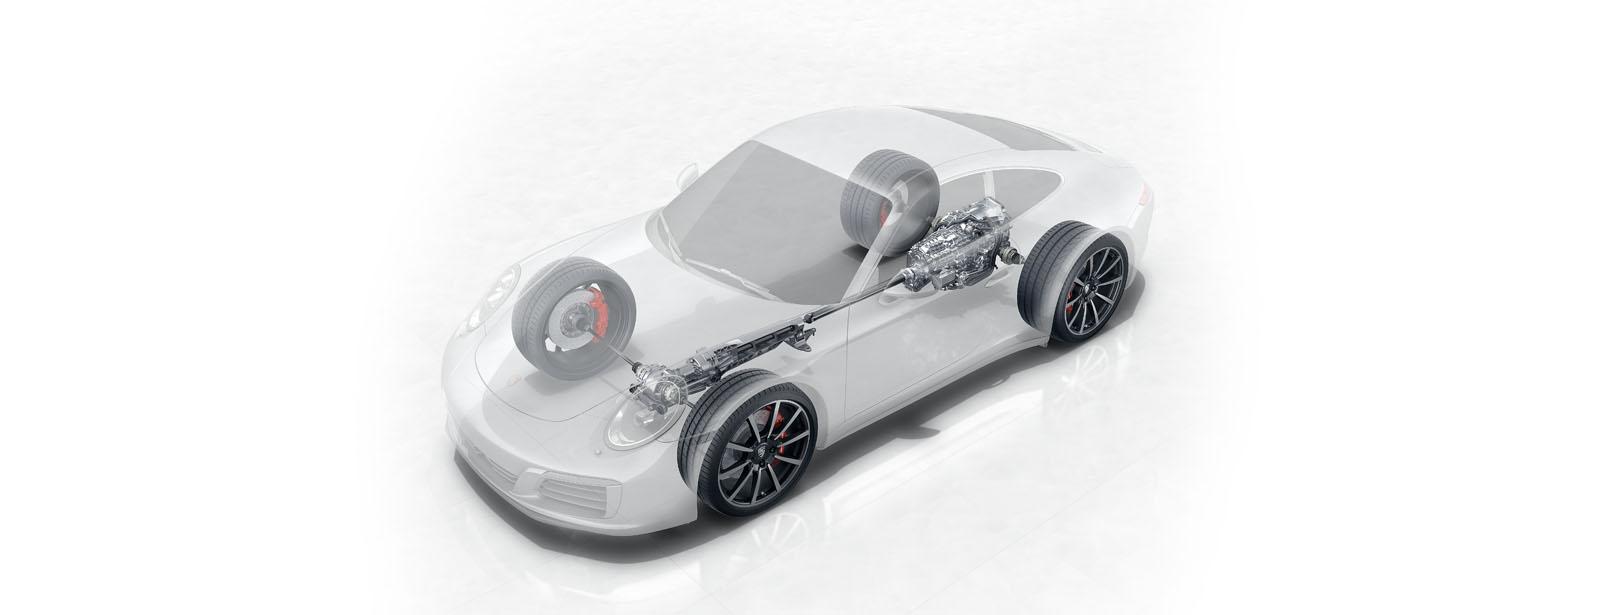 Porsche 911 Drive Train